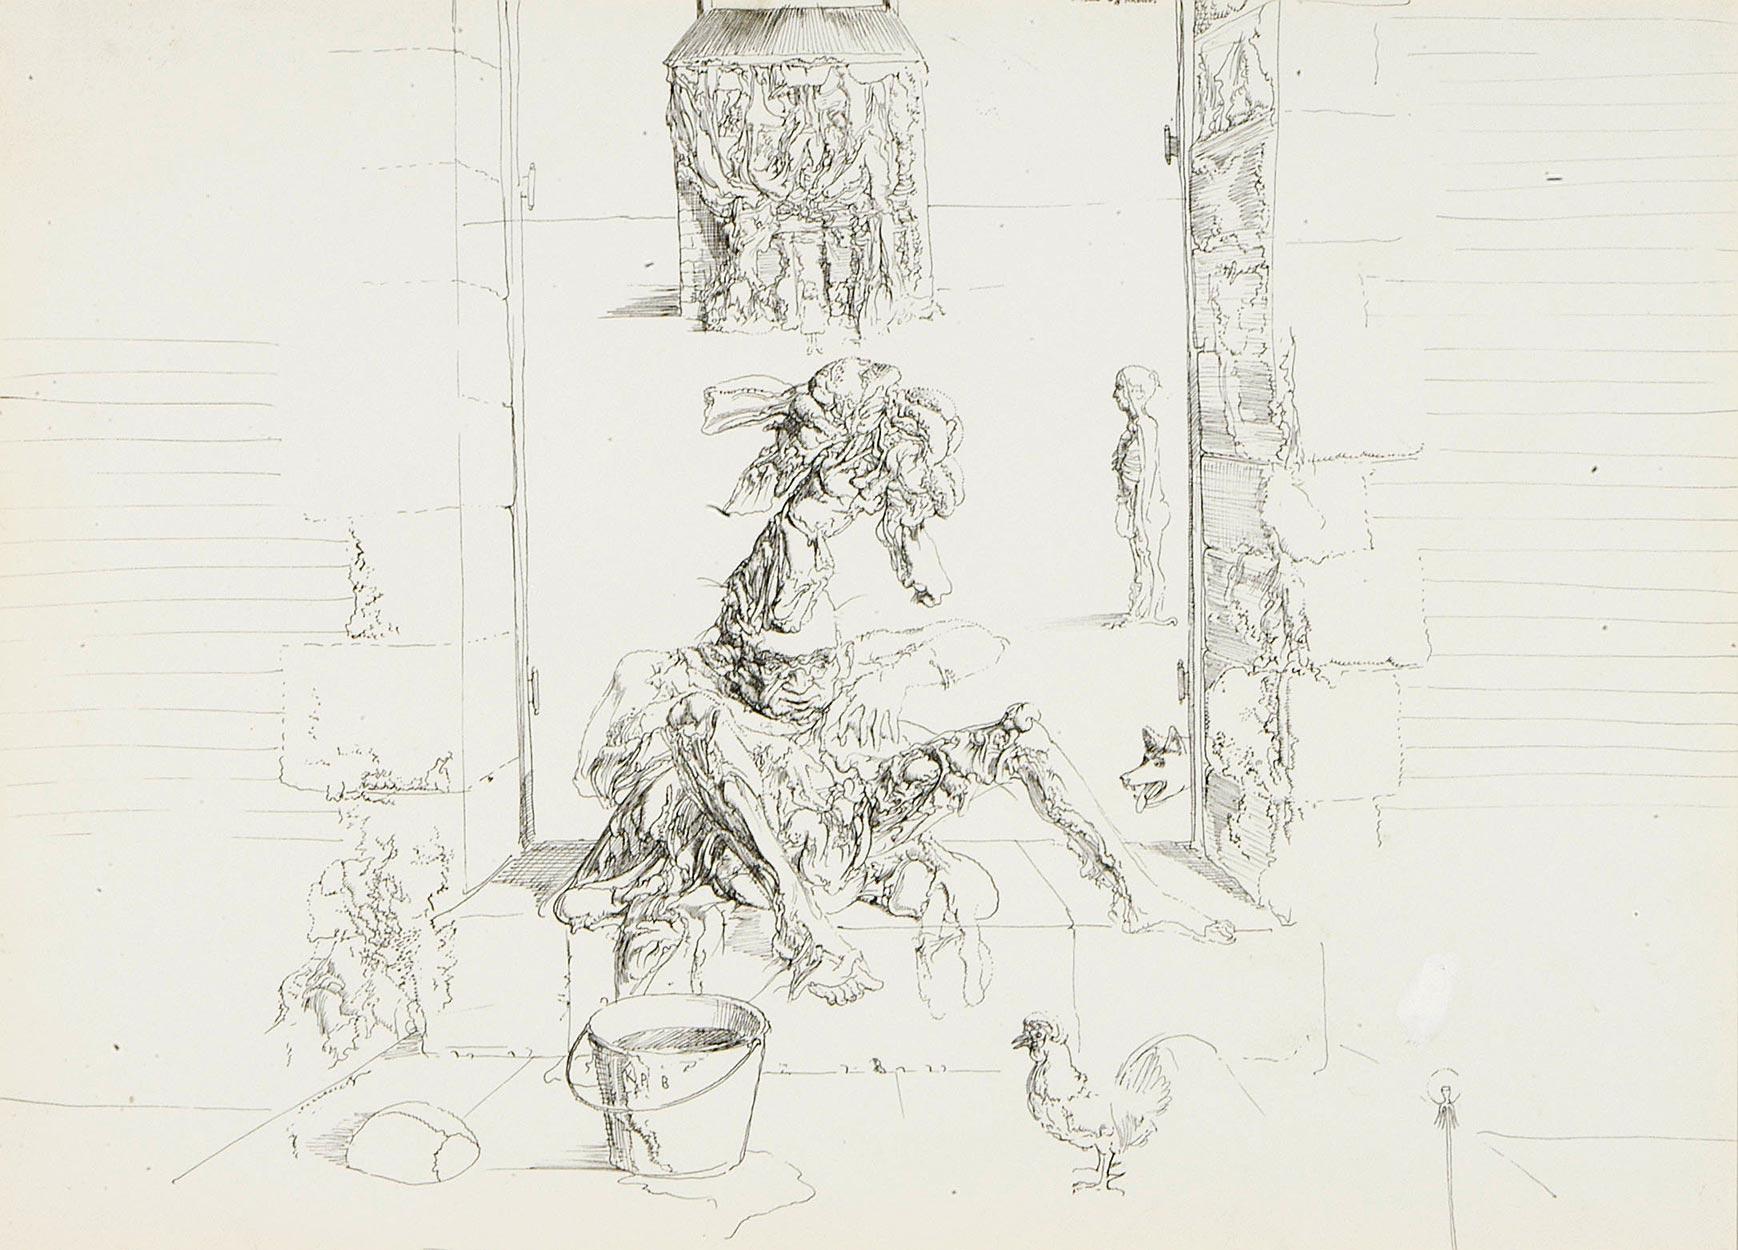 Untitled, 1968